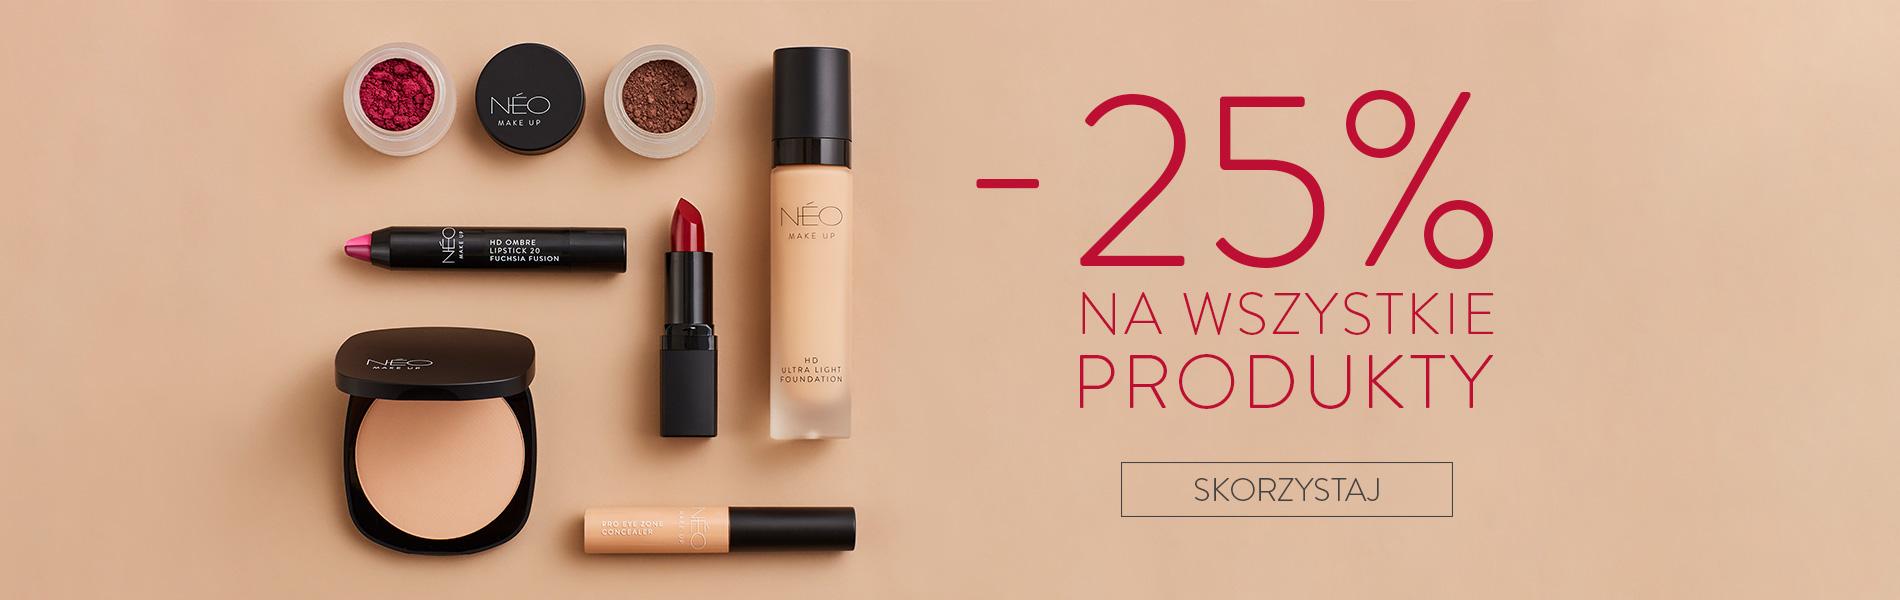 Rabat 25% na cały asortyment NEO Make Up